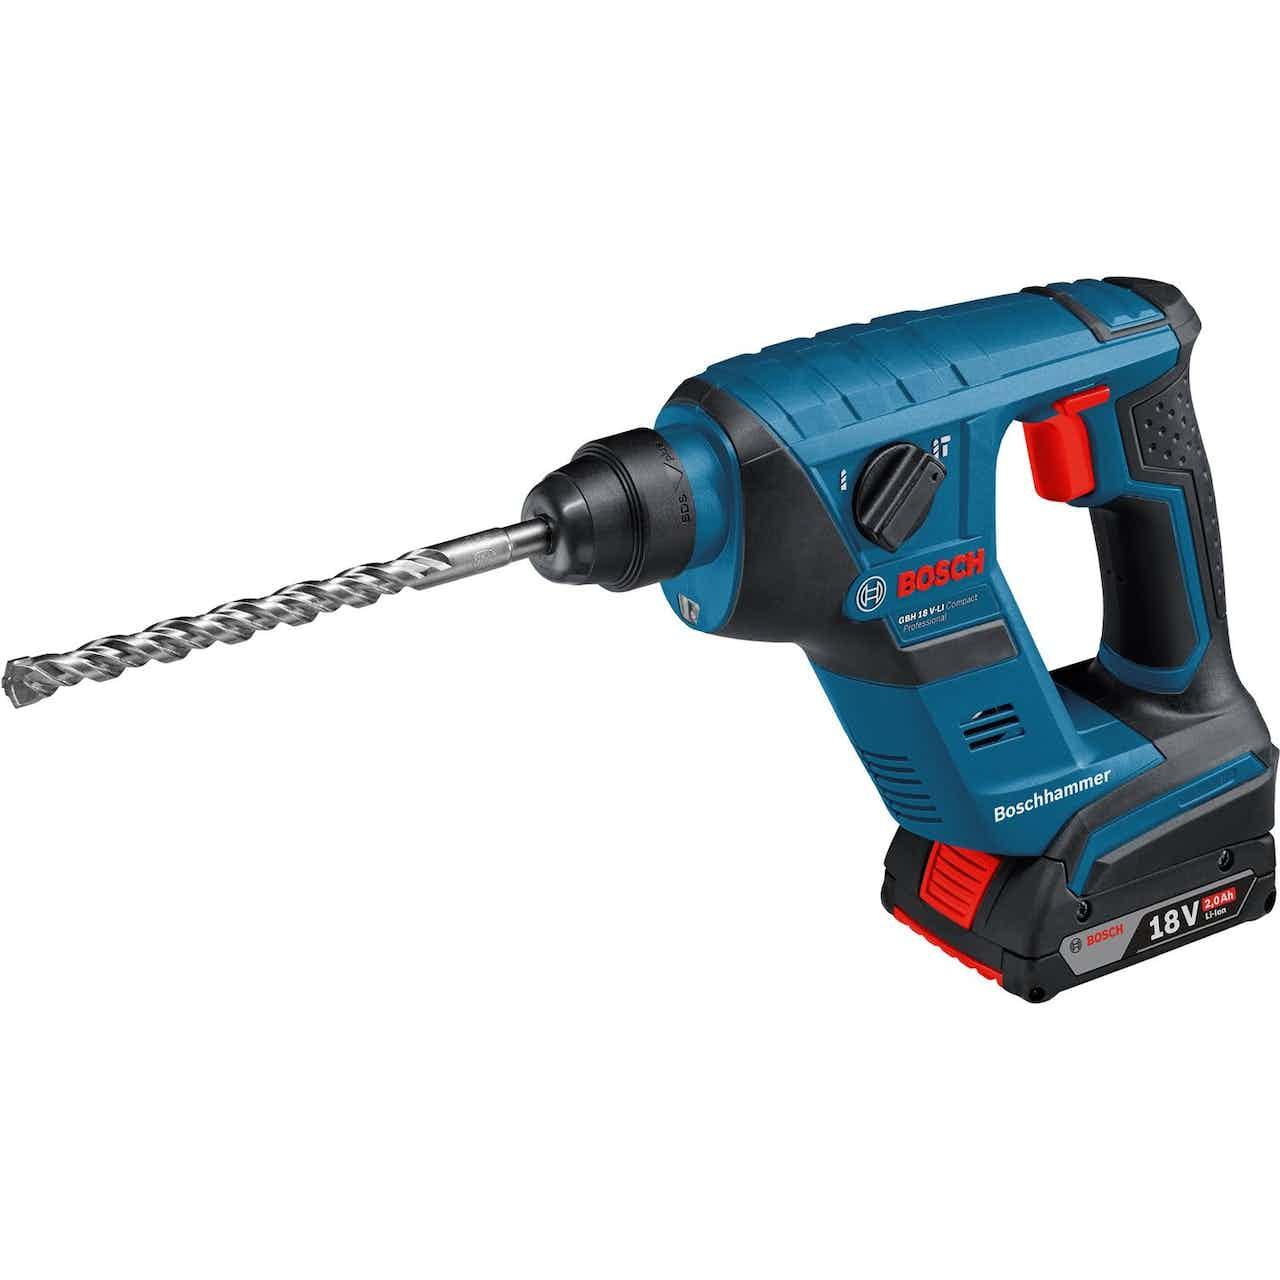 Bosch Professional Akku-Bohrhammer GBH 18 V-LI Compact